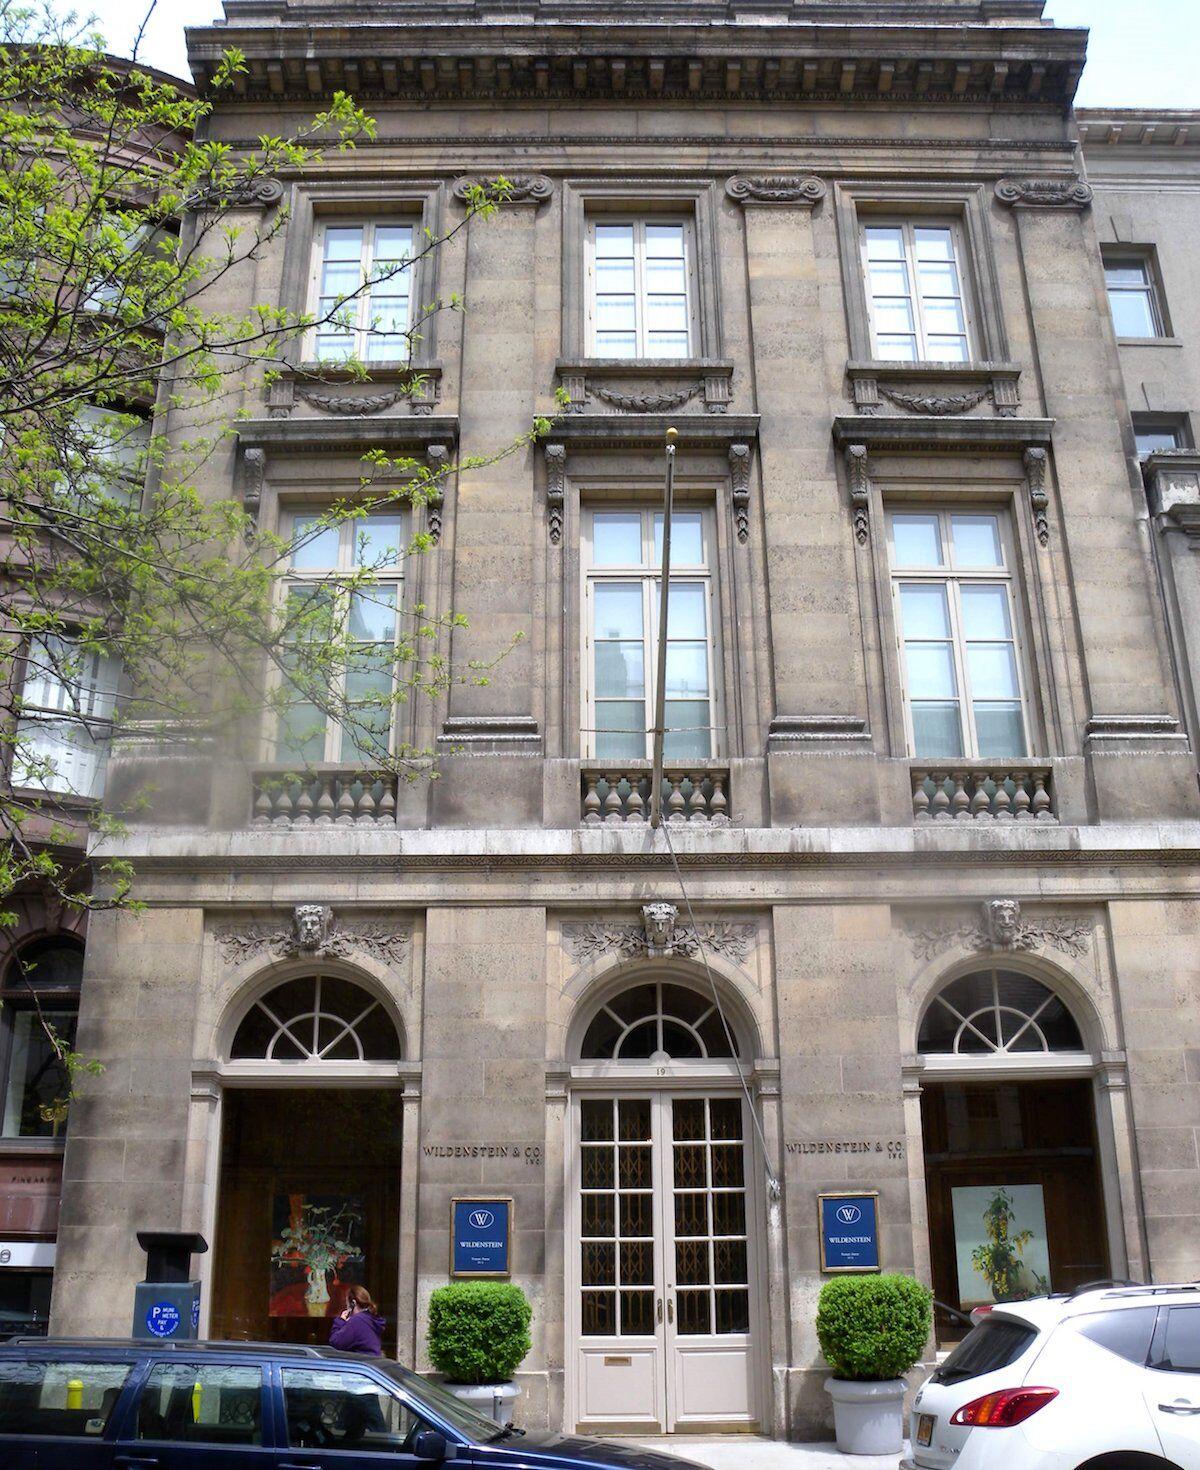 The former Manhattan headquarters of Wildenstein & Co. Photo by Jim.henderson, via Wikimedia Commons.